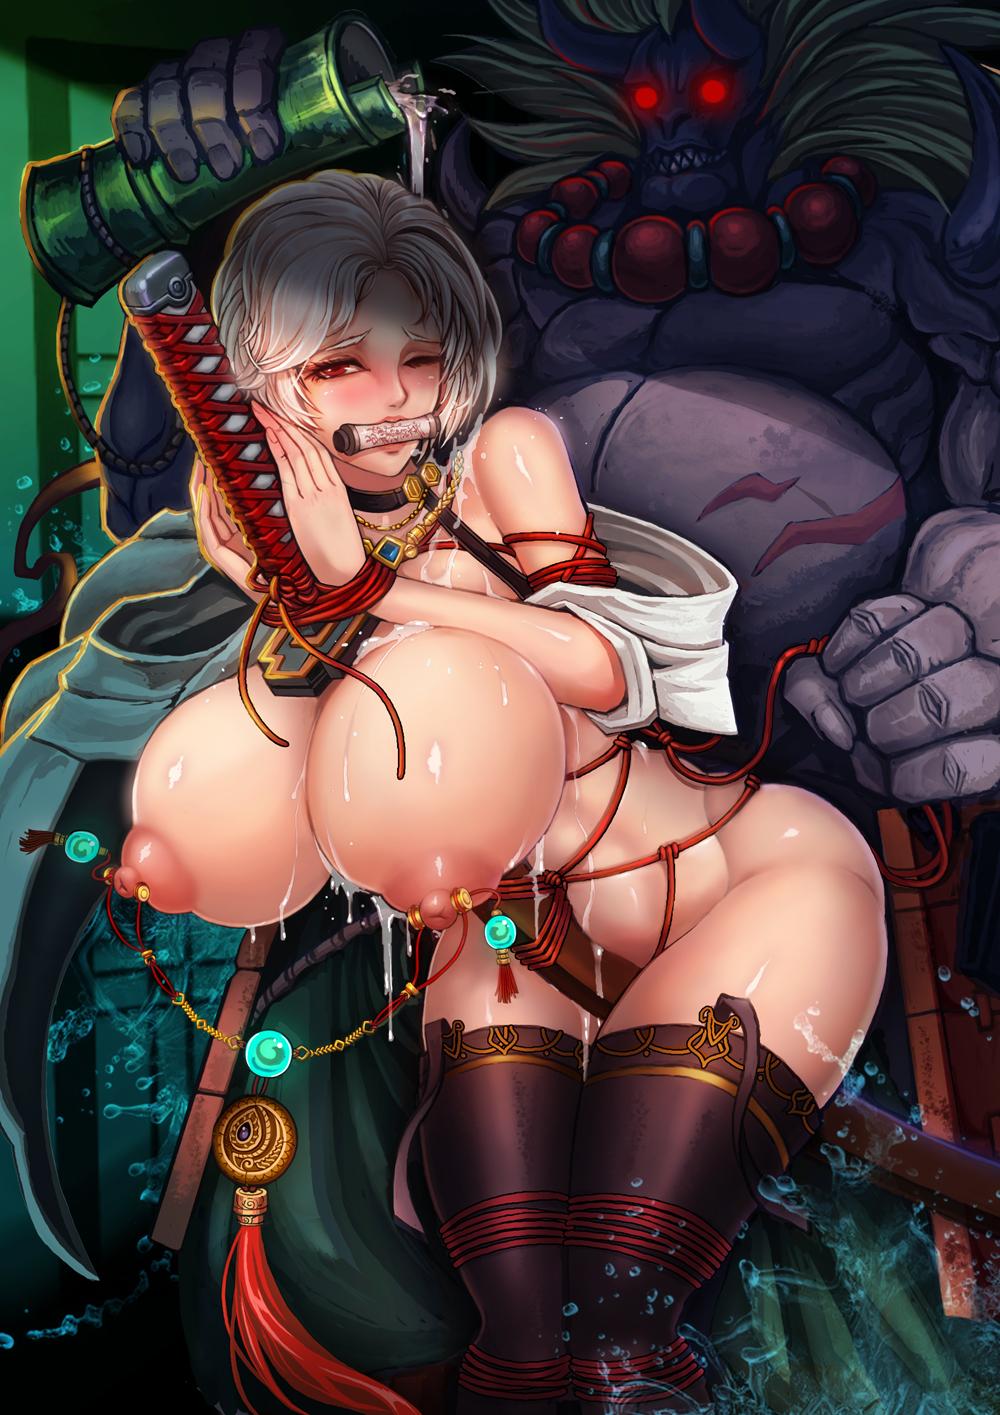 and serana pregnant dragonborn fanfiction Resident evil ada wong porn